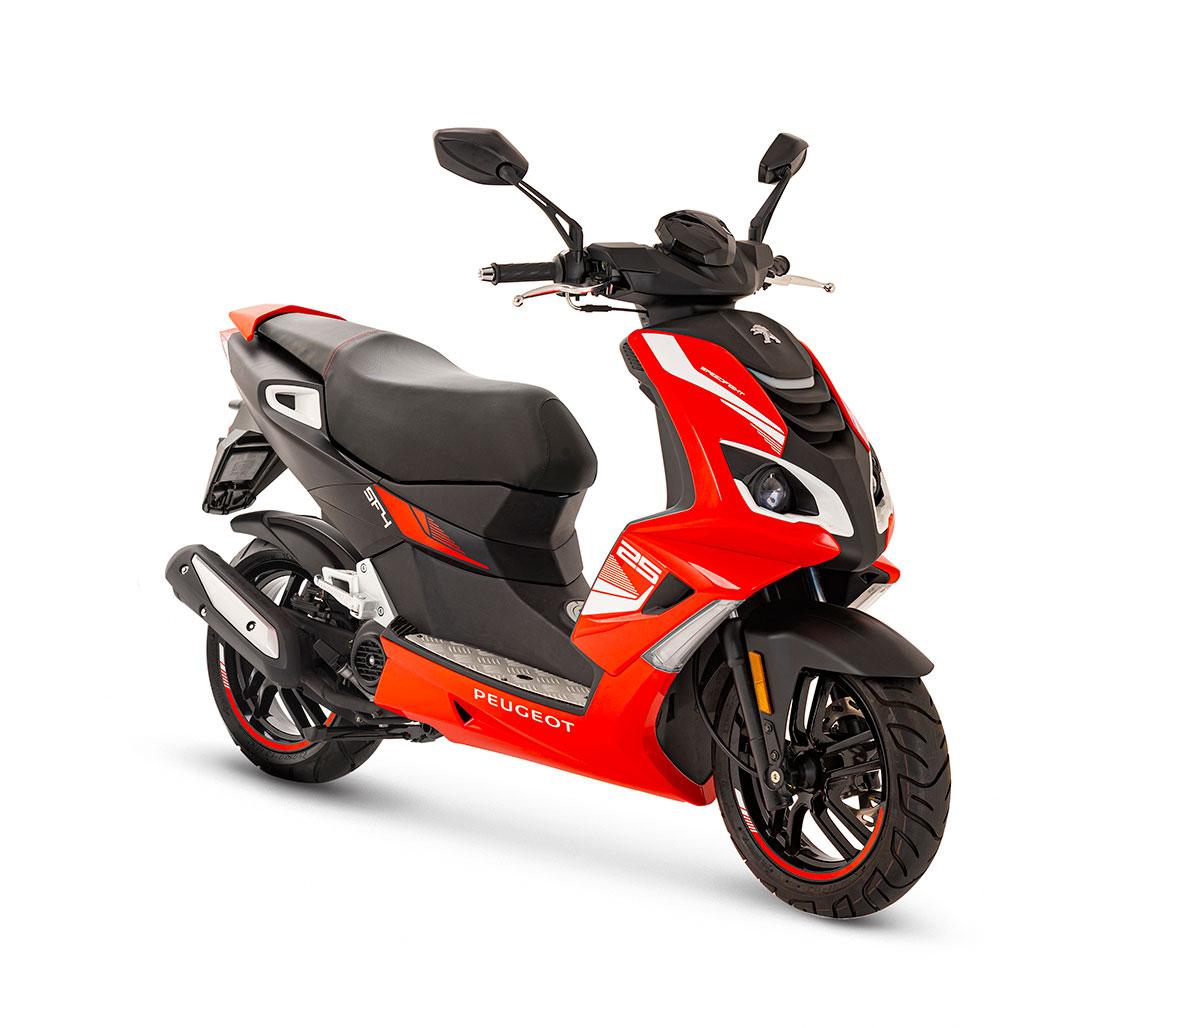 Novedades de Peugeot Motorcycles para 2021